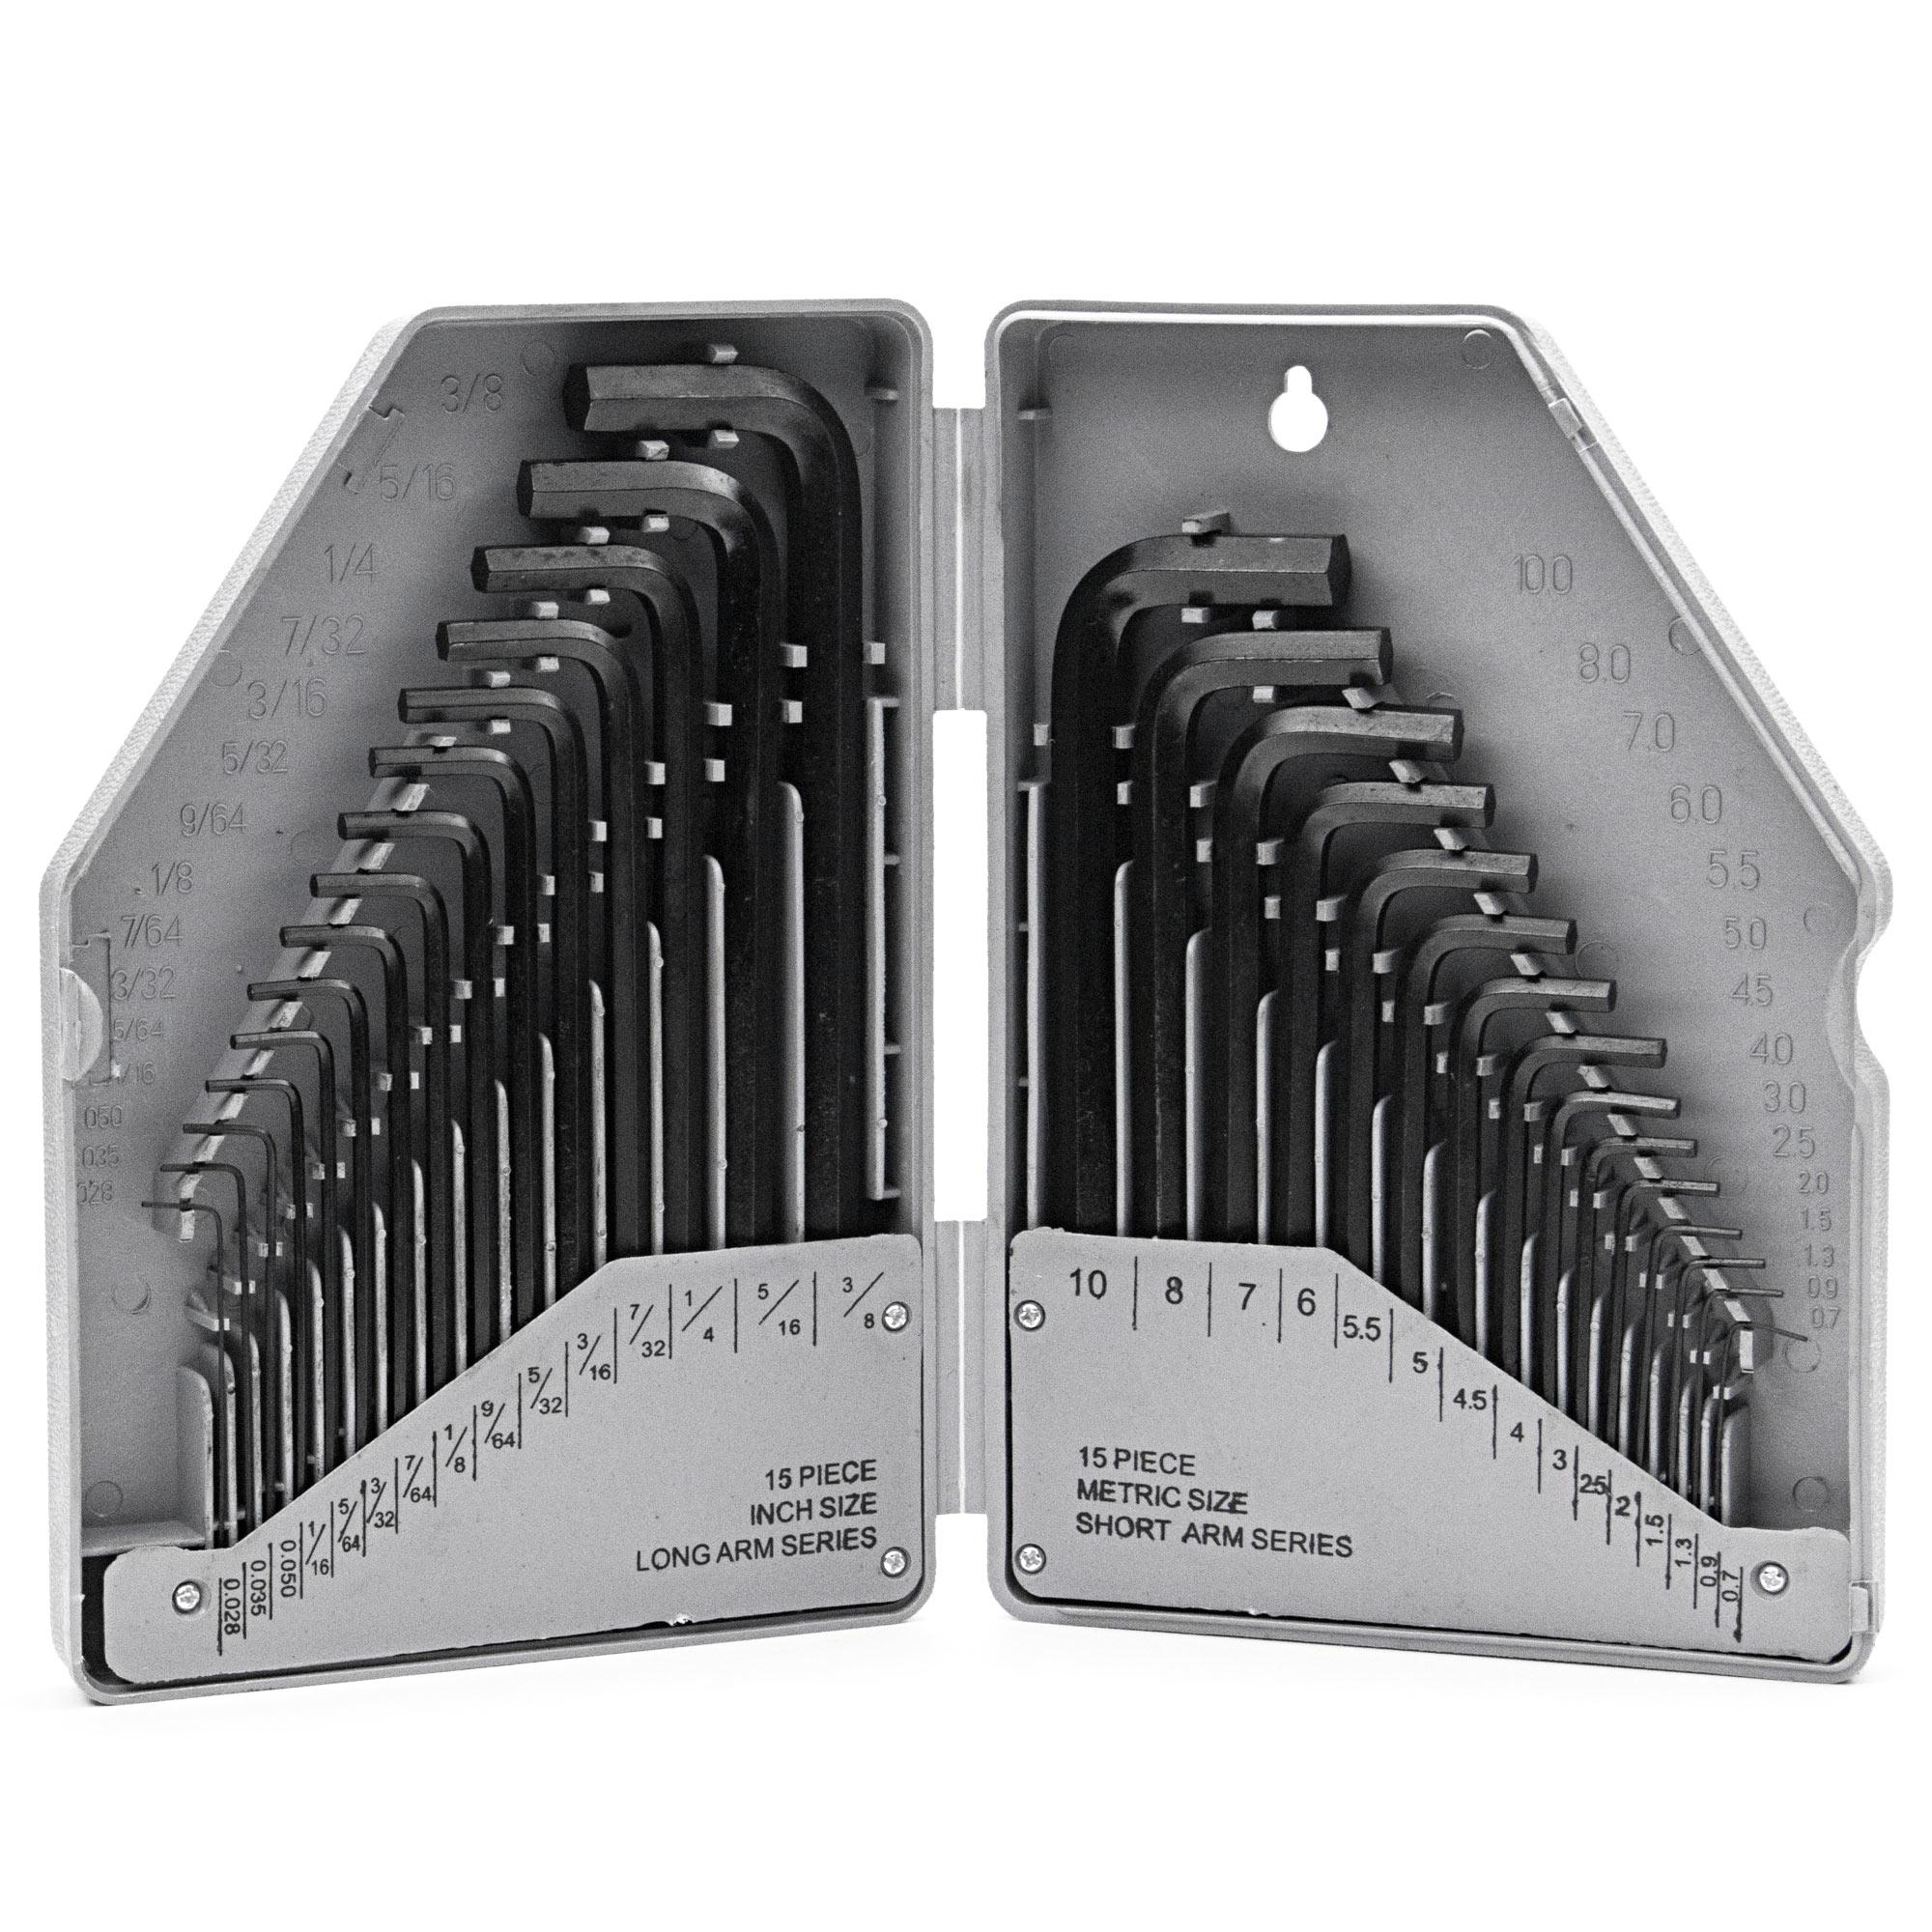 Biltek Biltek 30PC Long Arm Hex Key SAE Metric Cr-V Allen L Wrench Driver Tool Set New